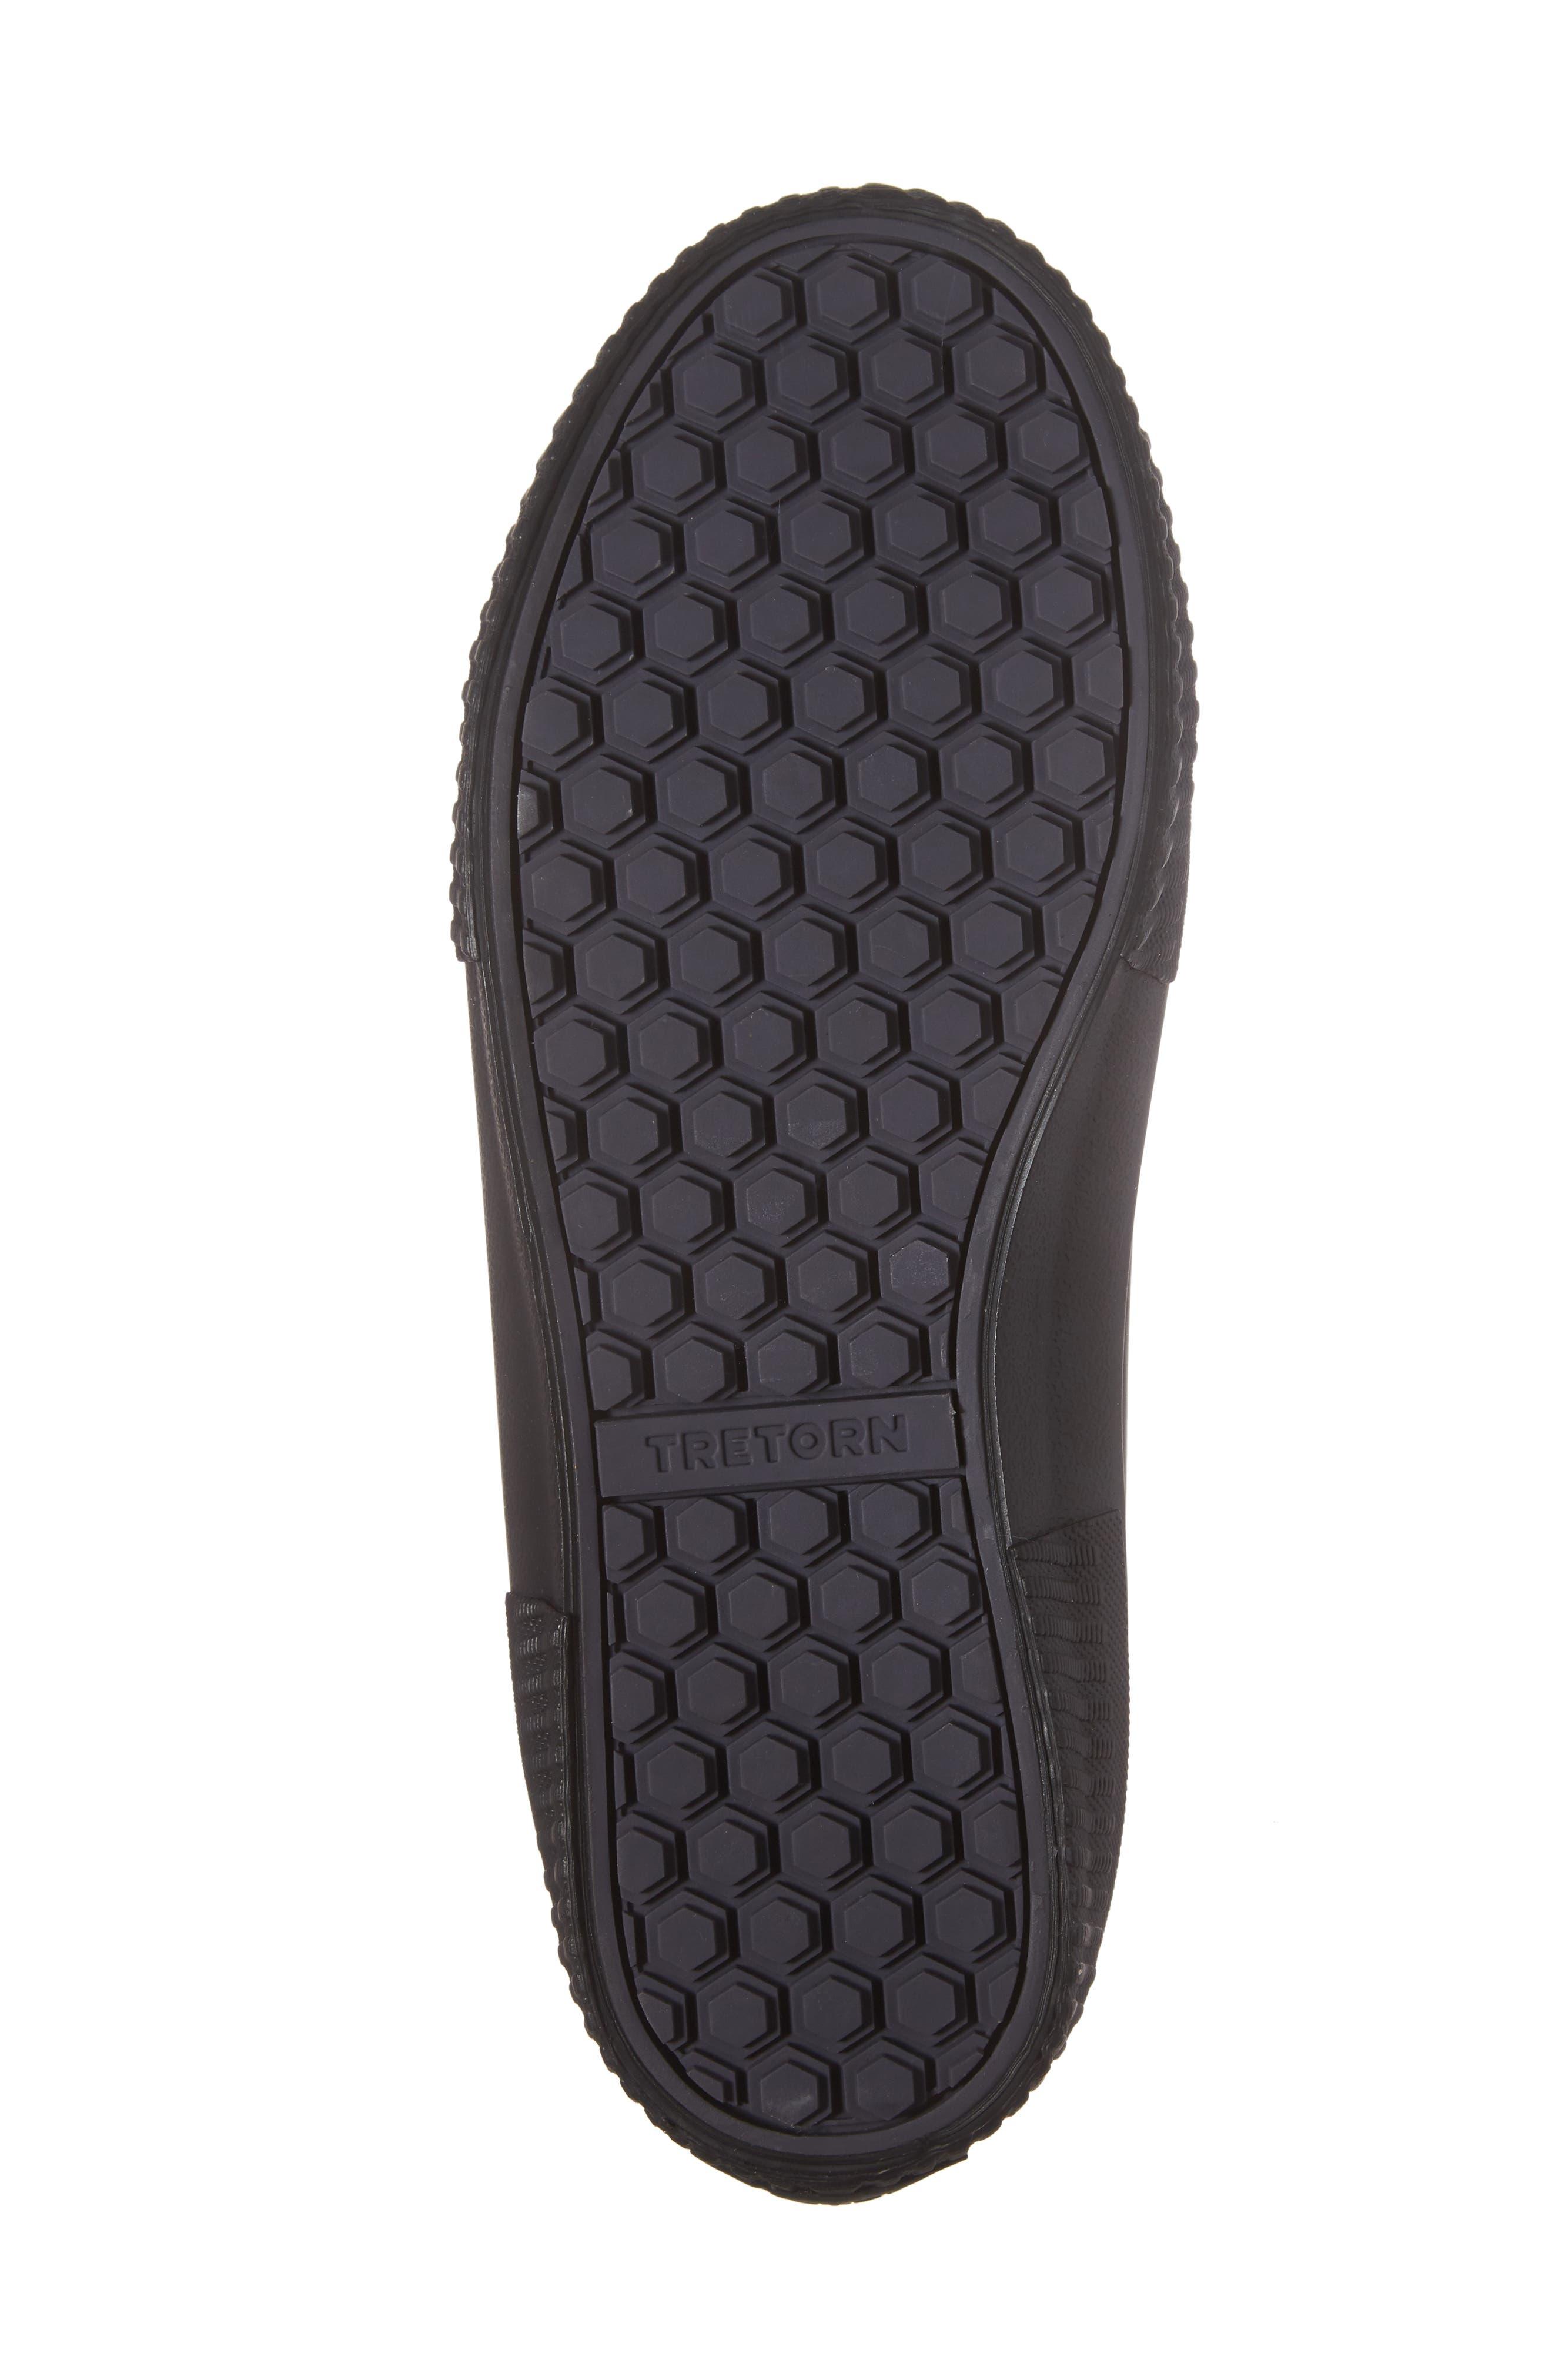 TRETORN, Guswnt Chelsea Waterproof Boot, Alternate thumbnail 6, color, BLACK/ BLACK